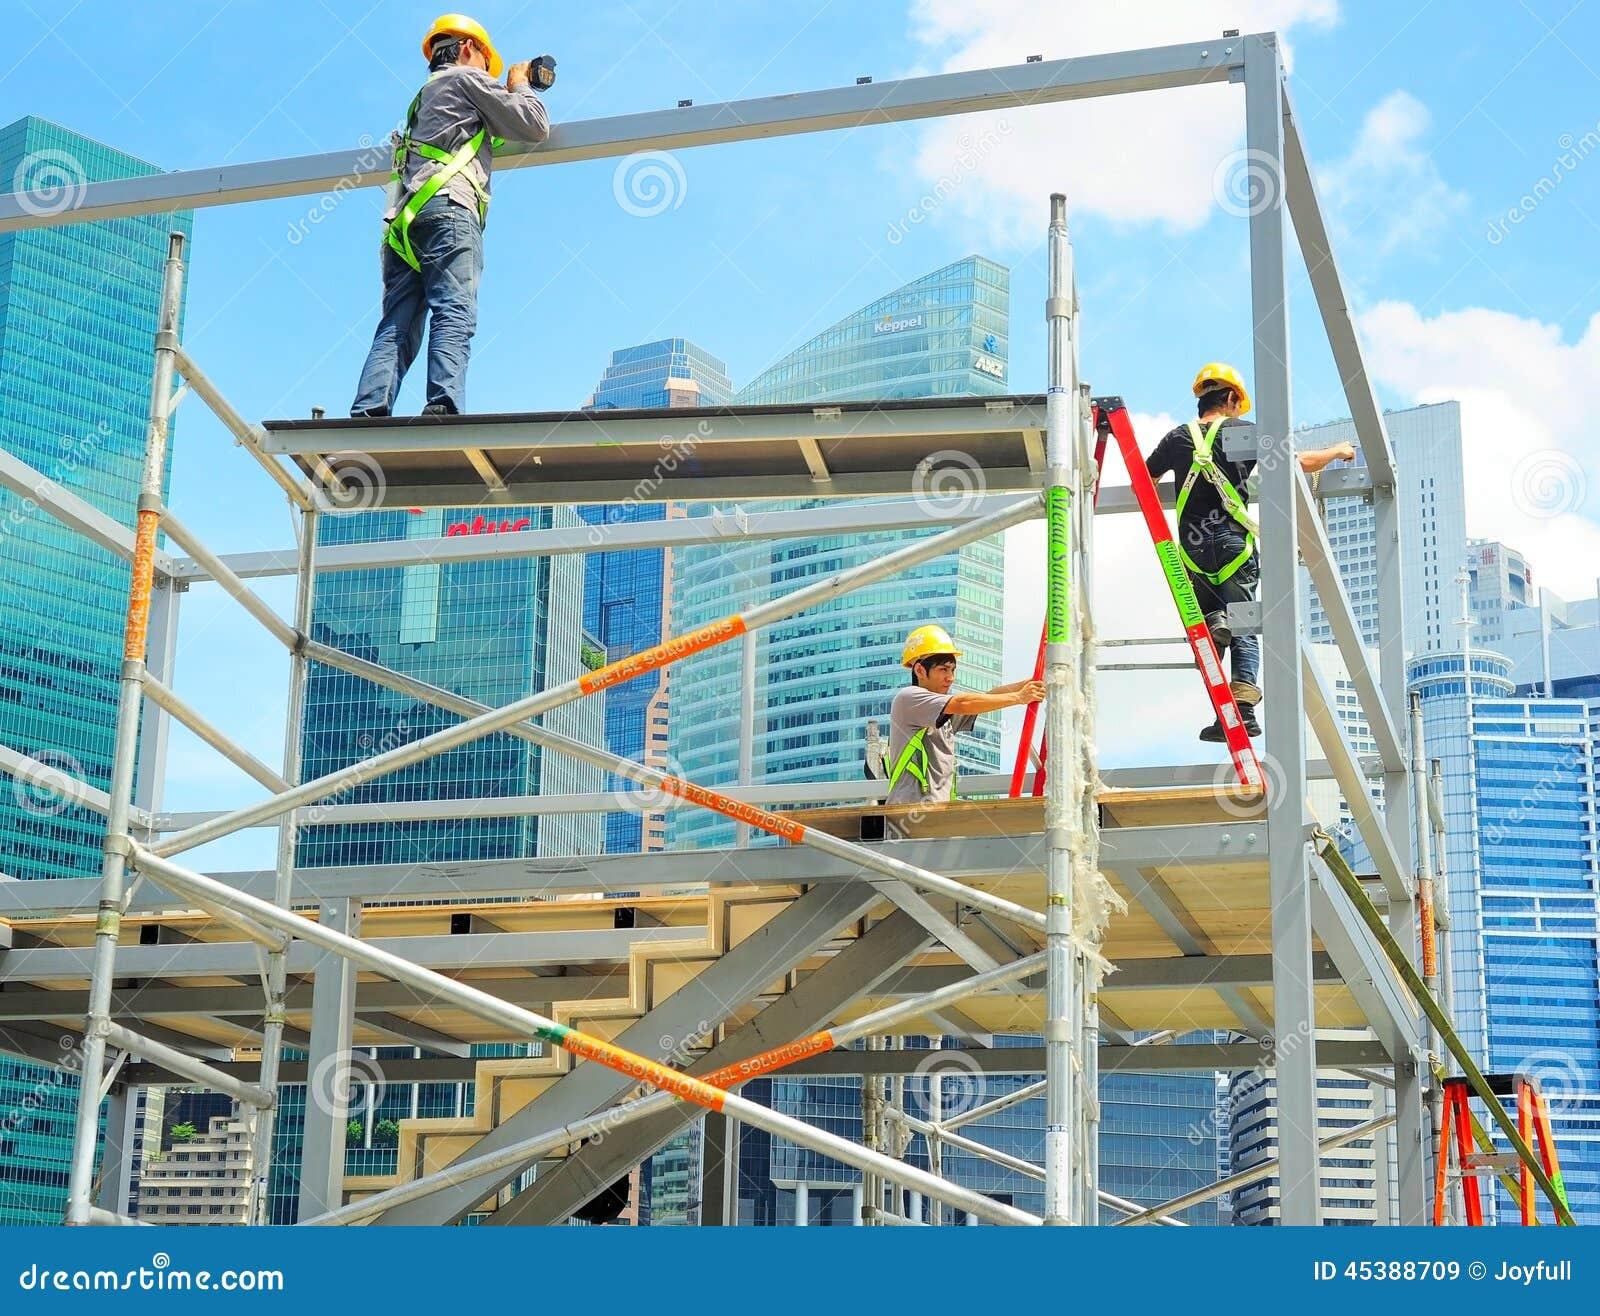 Peddinghaus Industry Singapore: Construction Workers, Singapore Editorial Stock Image